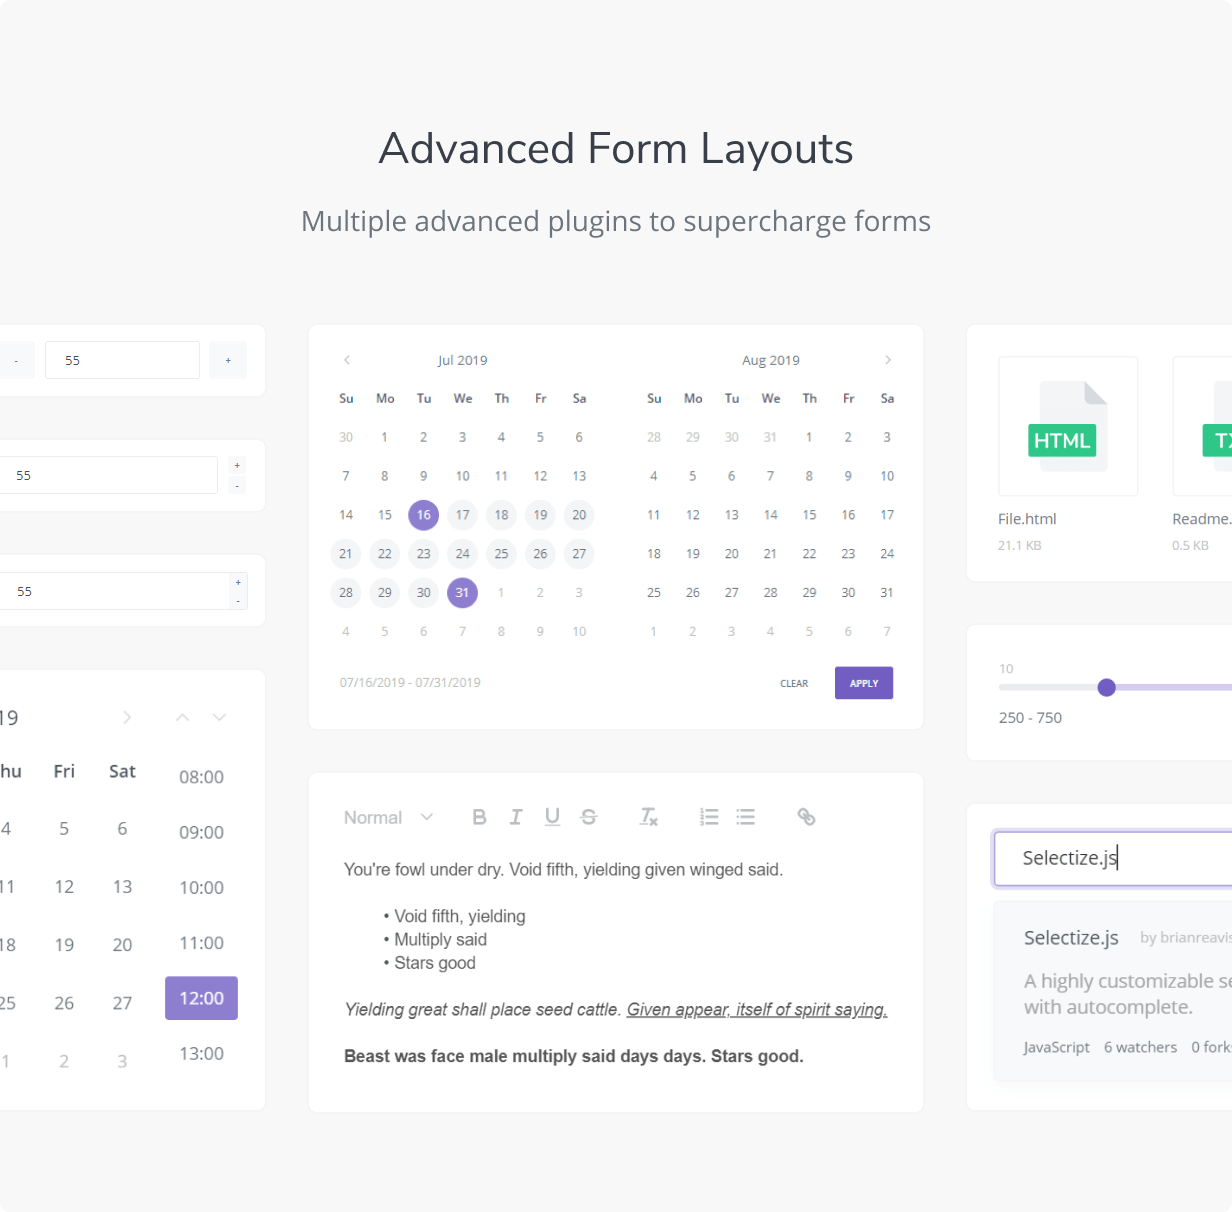 Advanced Form Layouts